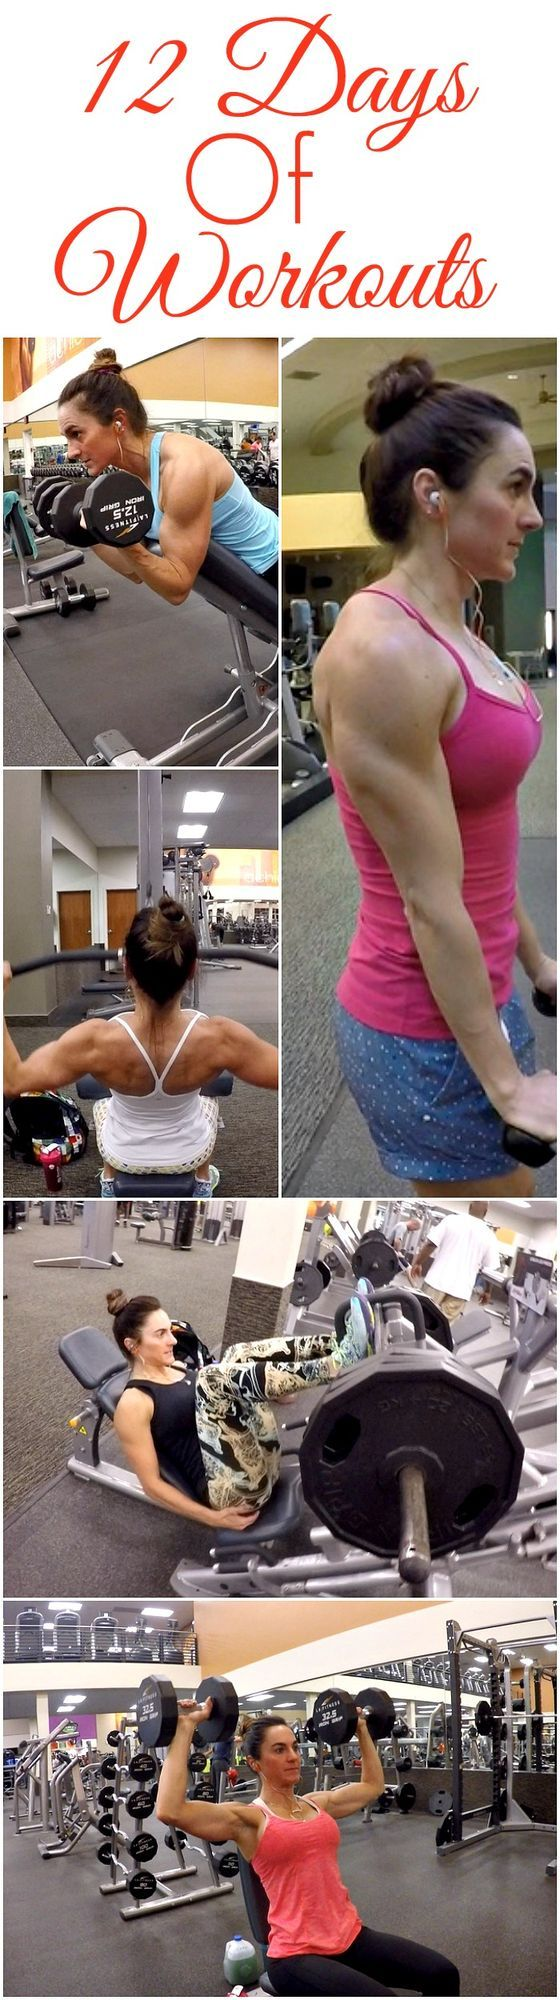 12 Days of Workouts   Fitness Food Diva   Bloglovin'